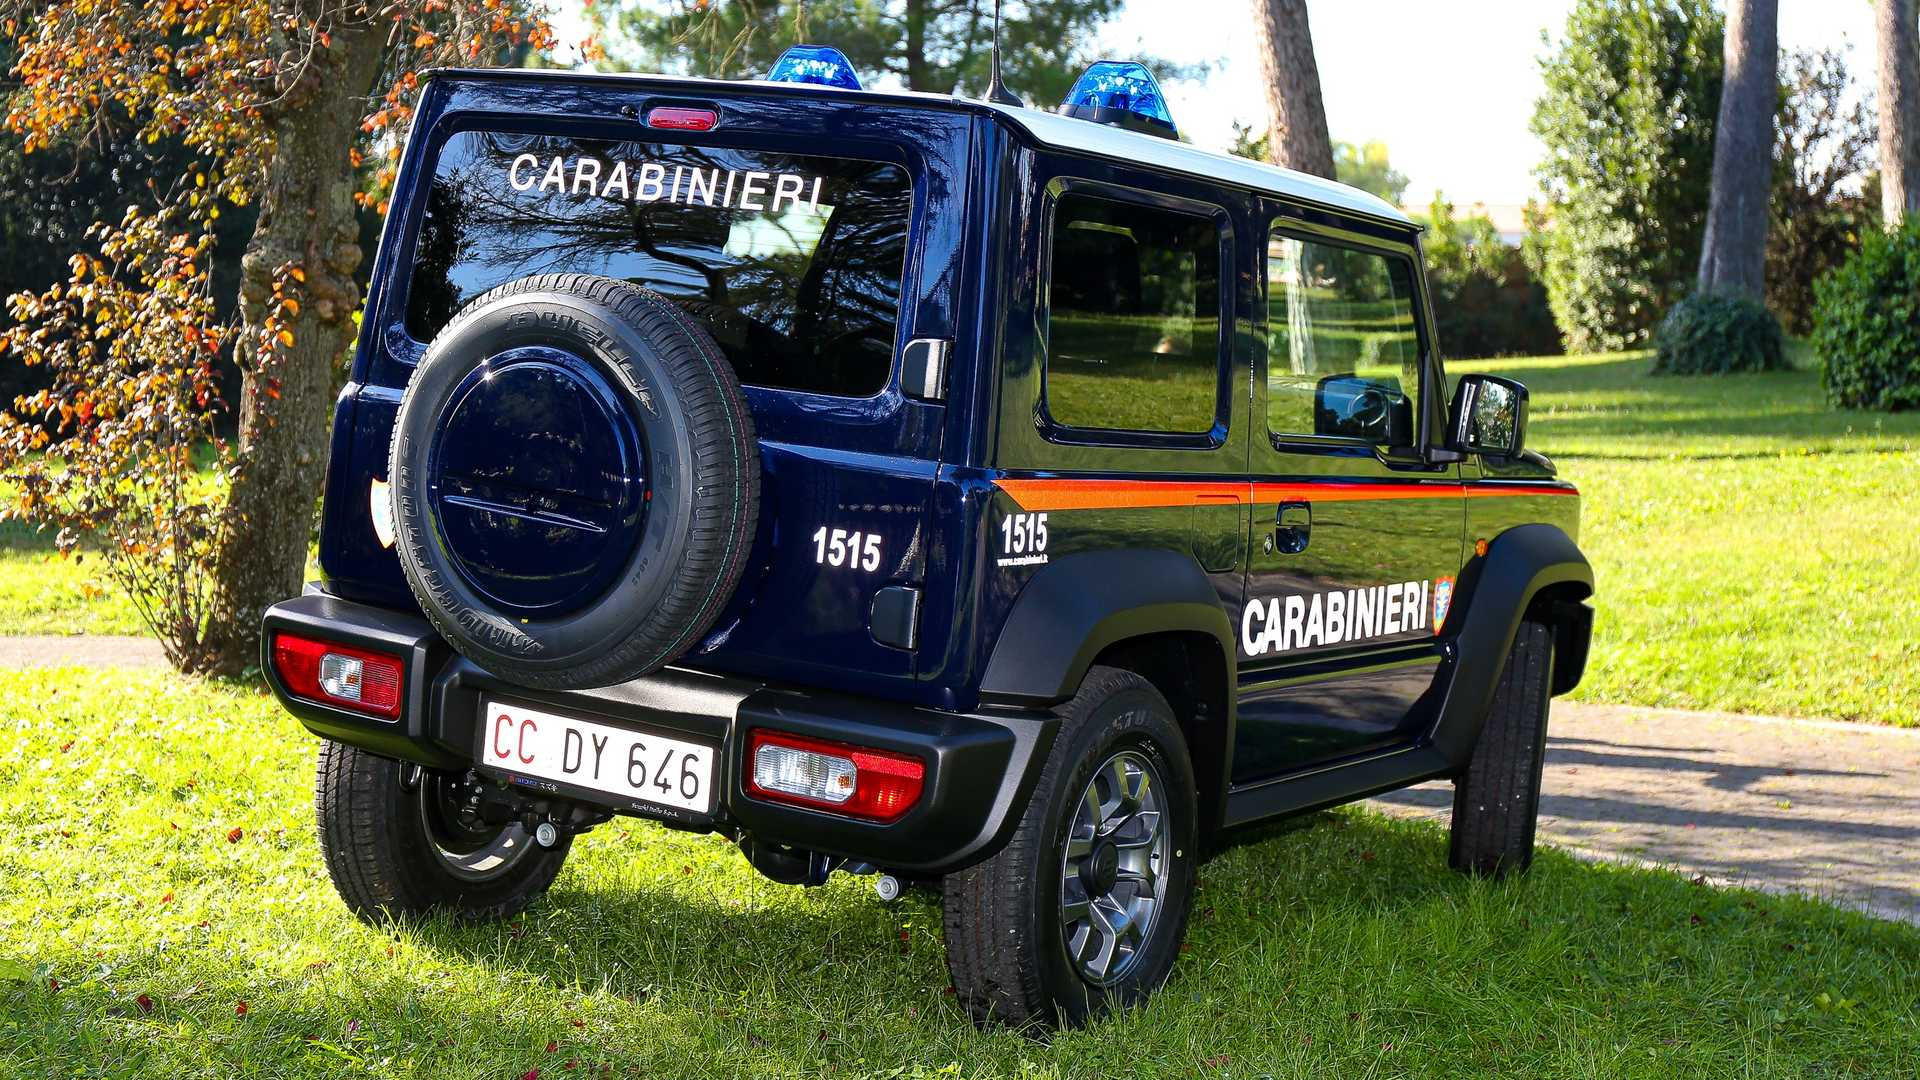 suzuki-jimny-all-arma-dei-carabinieri (1)